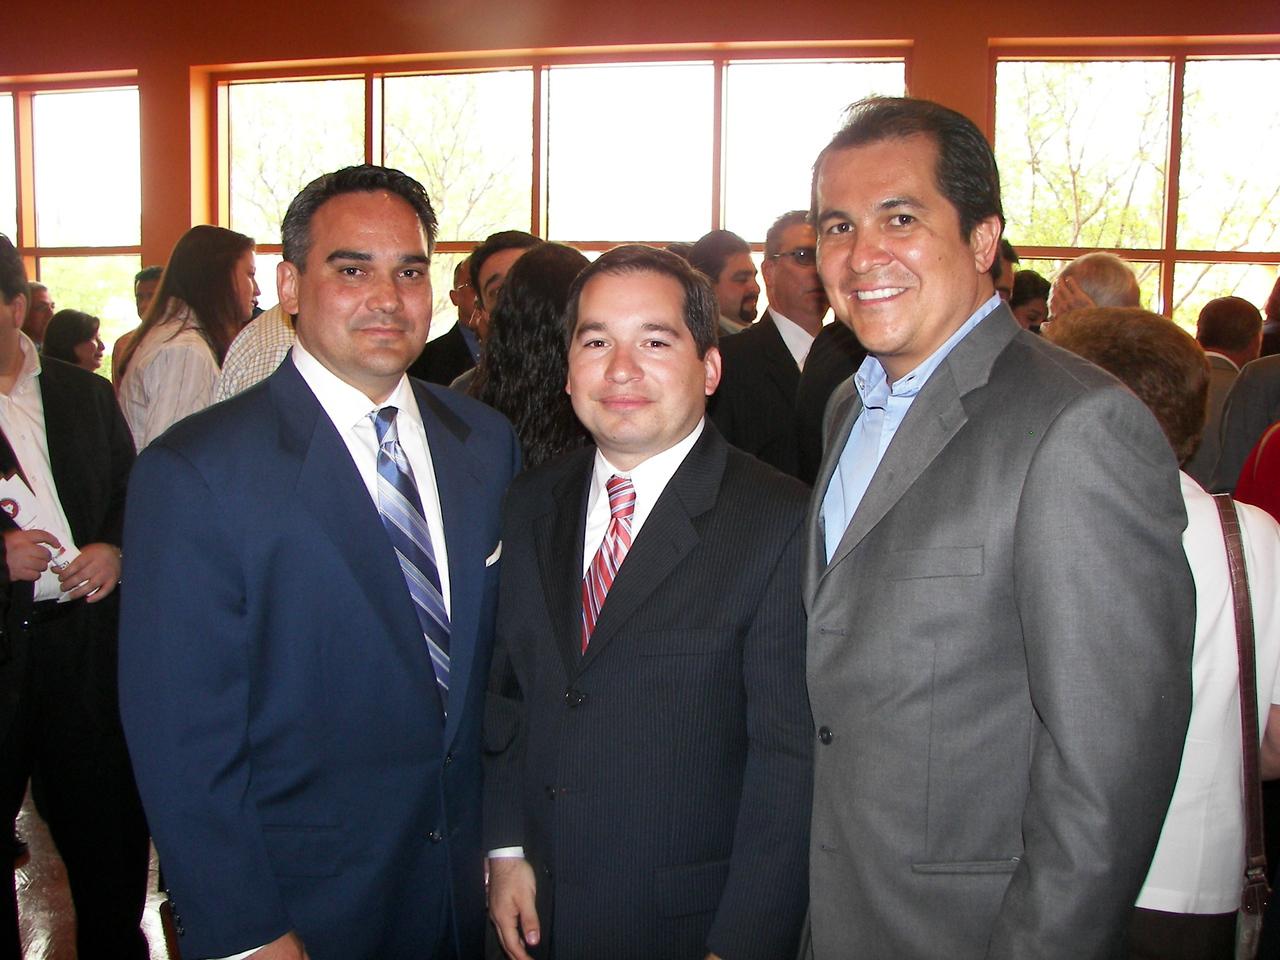 Reception Guests with HCADFW Corporate Partner Gabriel Almanza, Northwestern Mutual